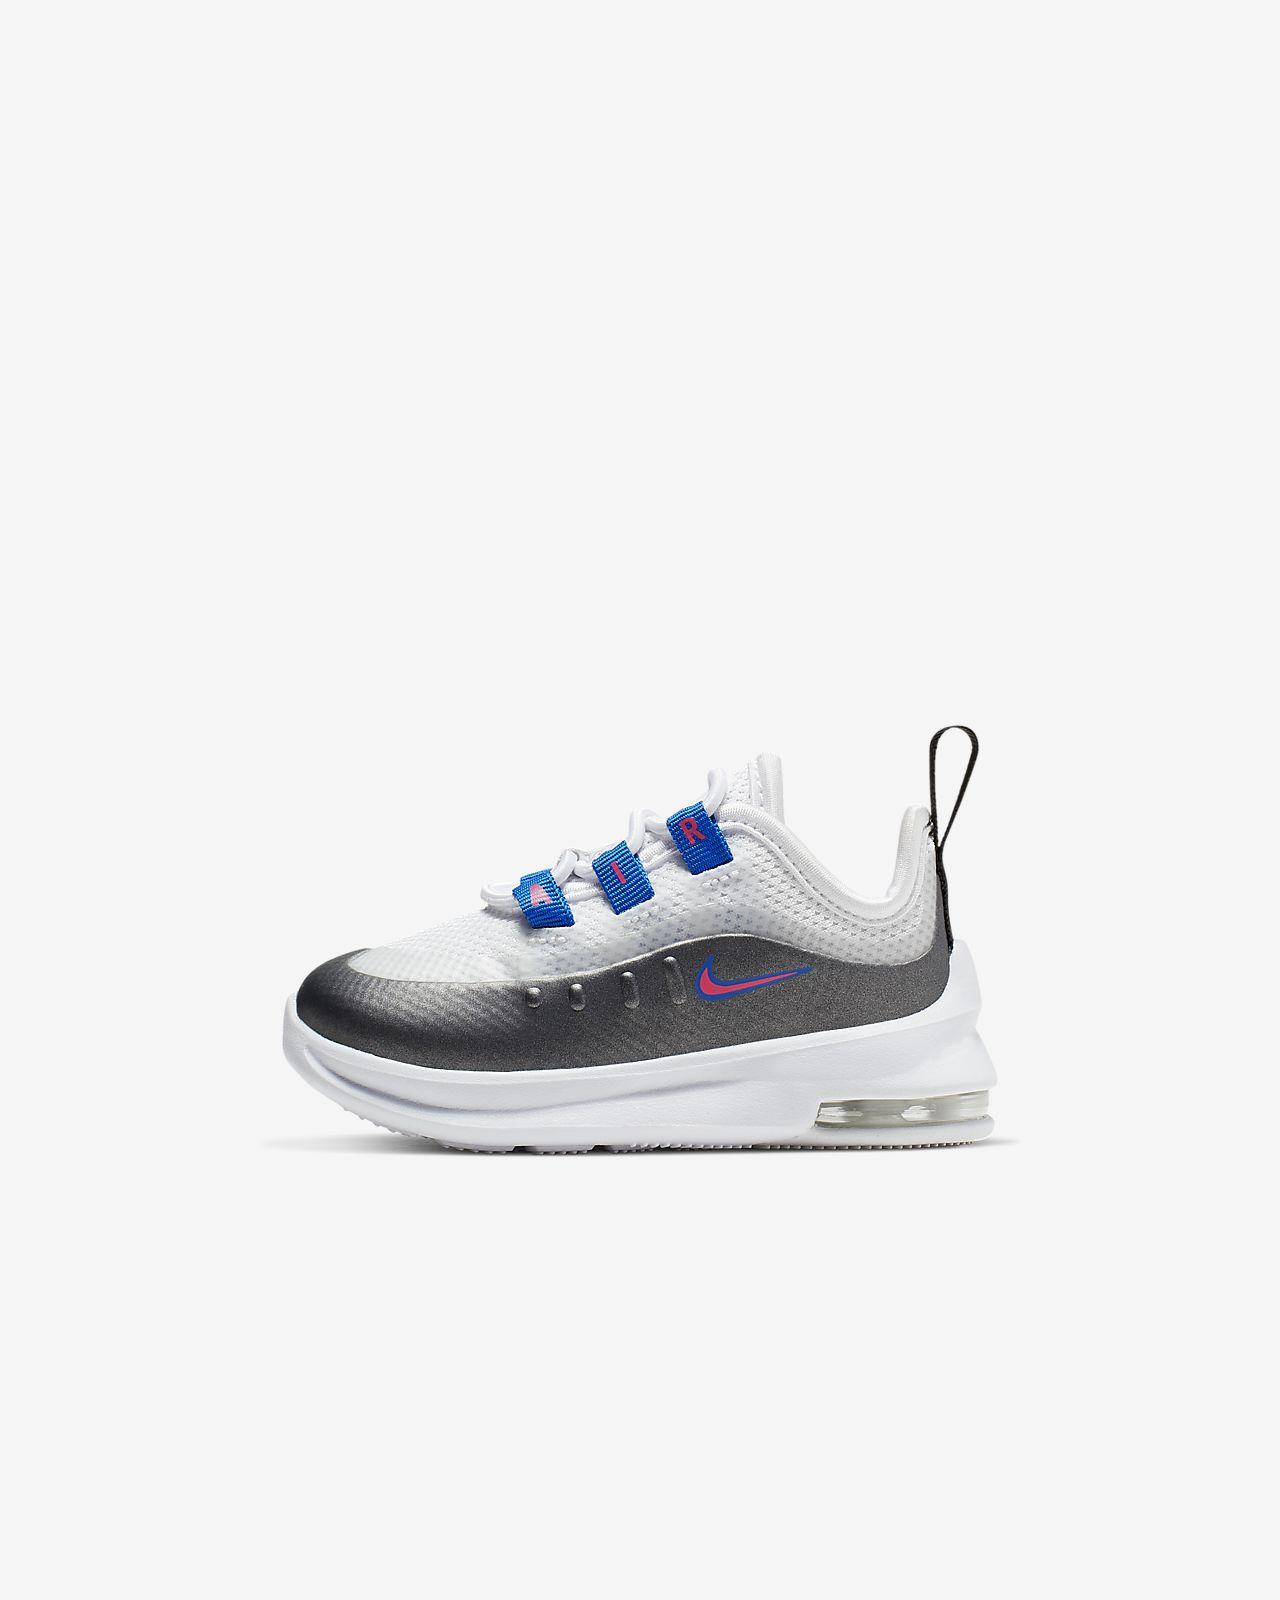 Sko Nike Air Max Axis för baby/småbarn